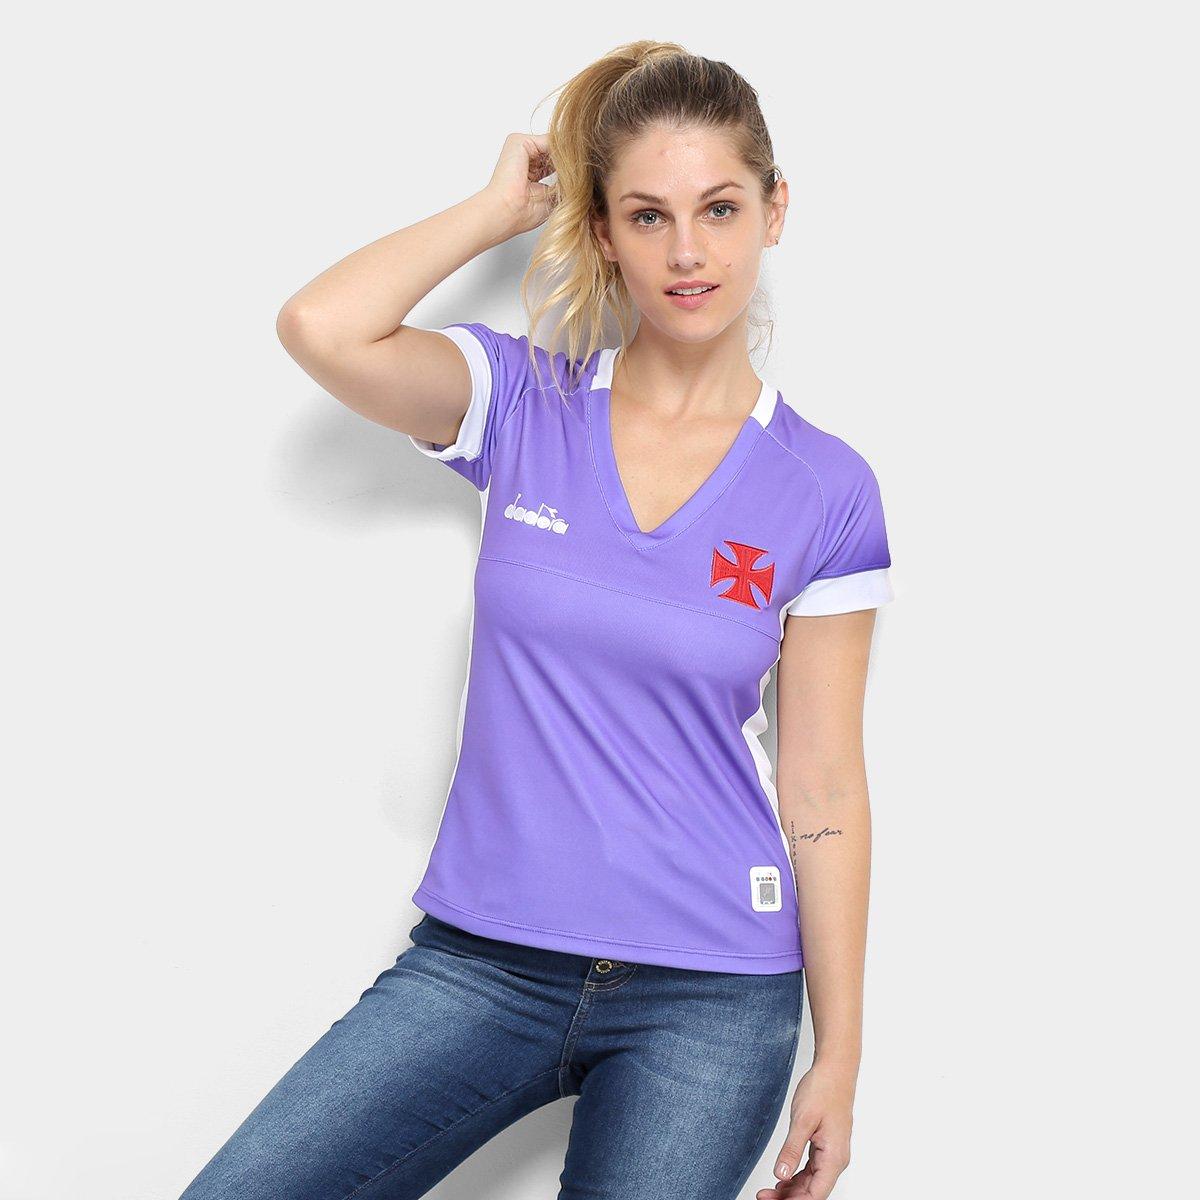 Camisa de Goleiro Vasco II 19 20 - Torcedor Diadora Feminina - Roxo ... 11d09b14ccded